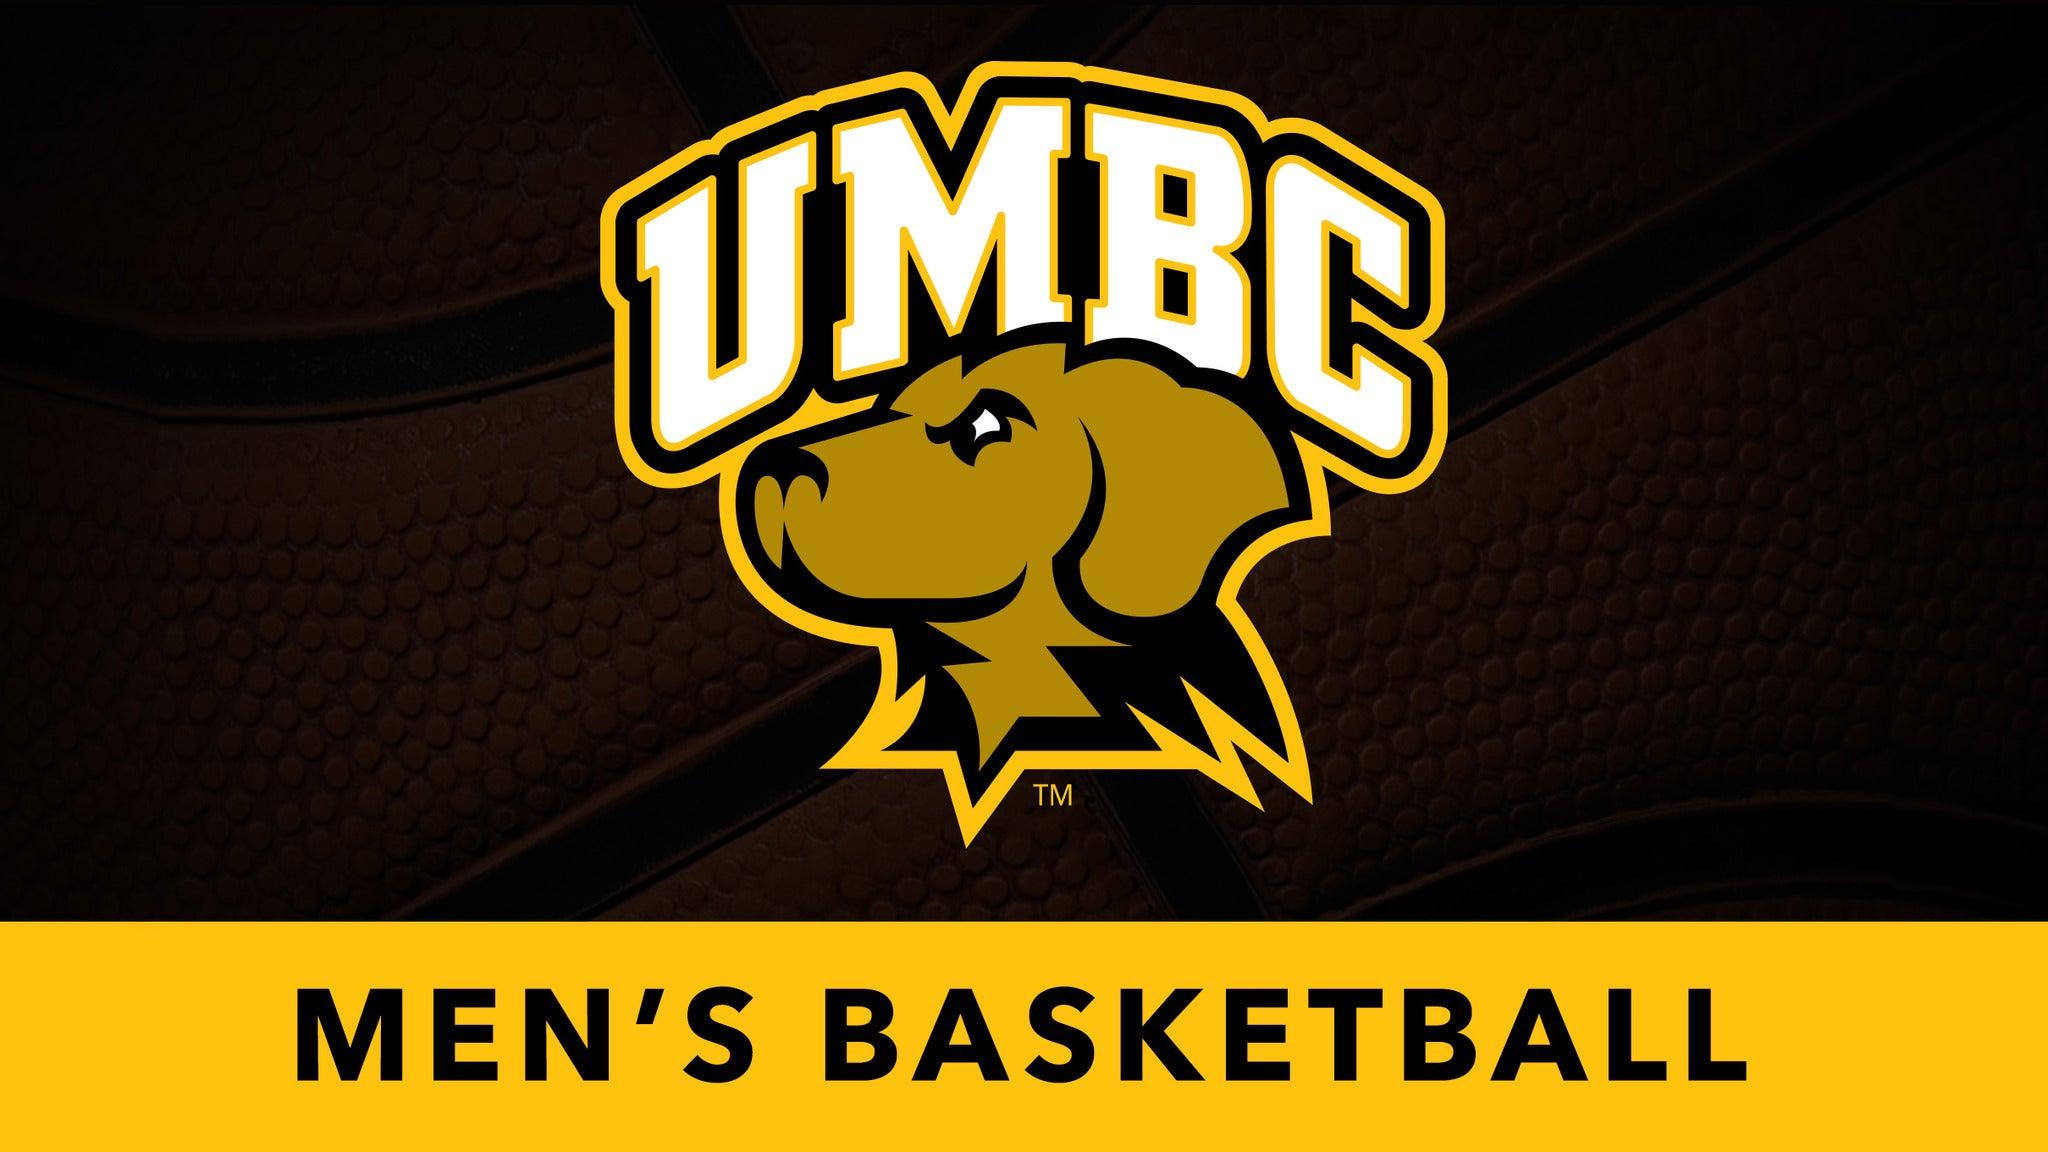 UMBC Retrievers Men's Basketball